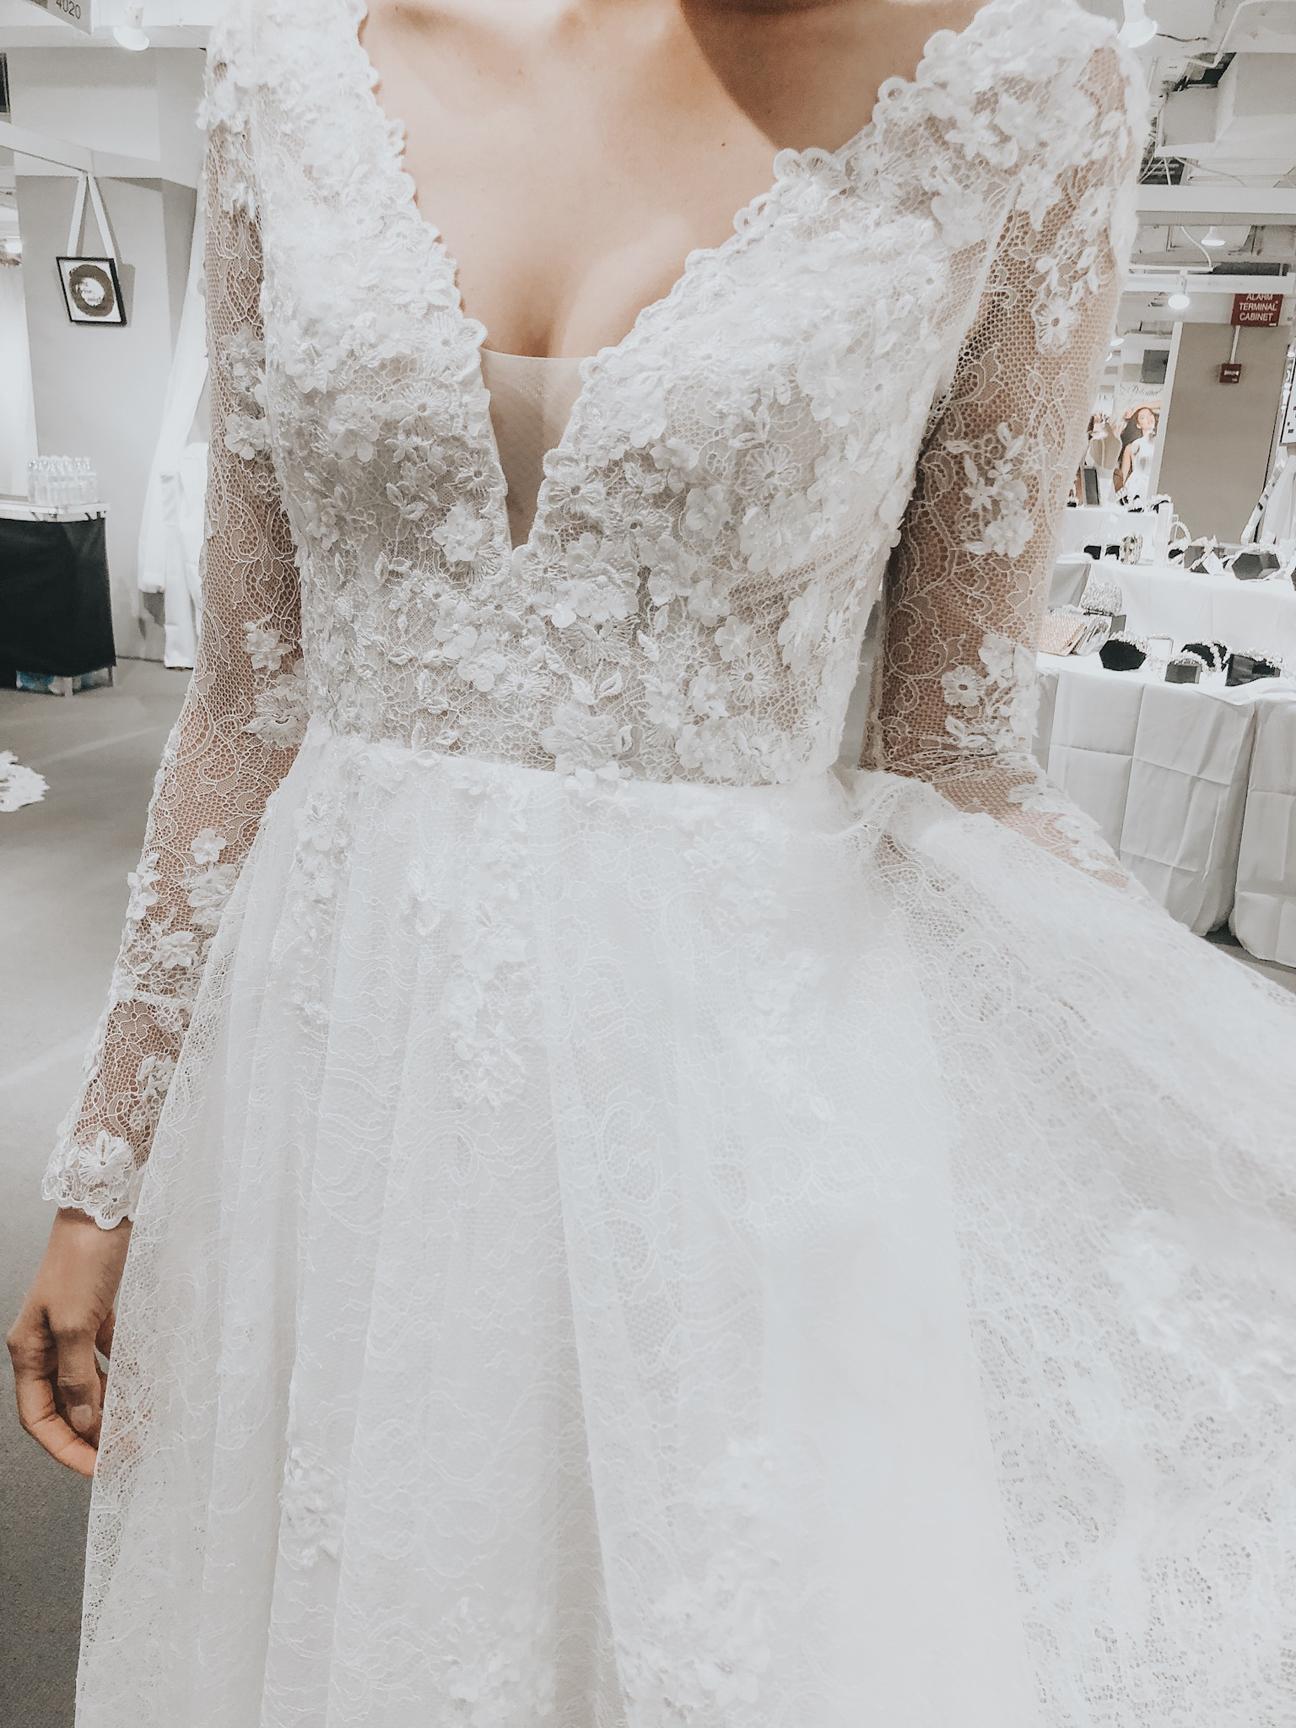 Lis-Simon-2020-Market-wedding-dress-couture-closet-Long-Sleeves.jpg